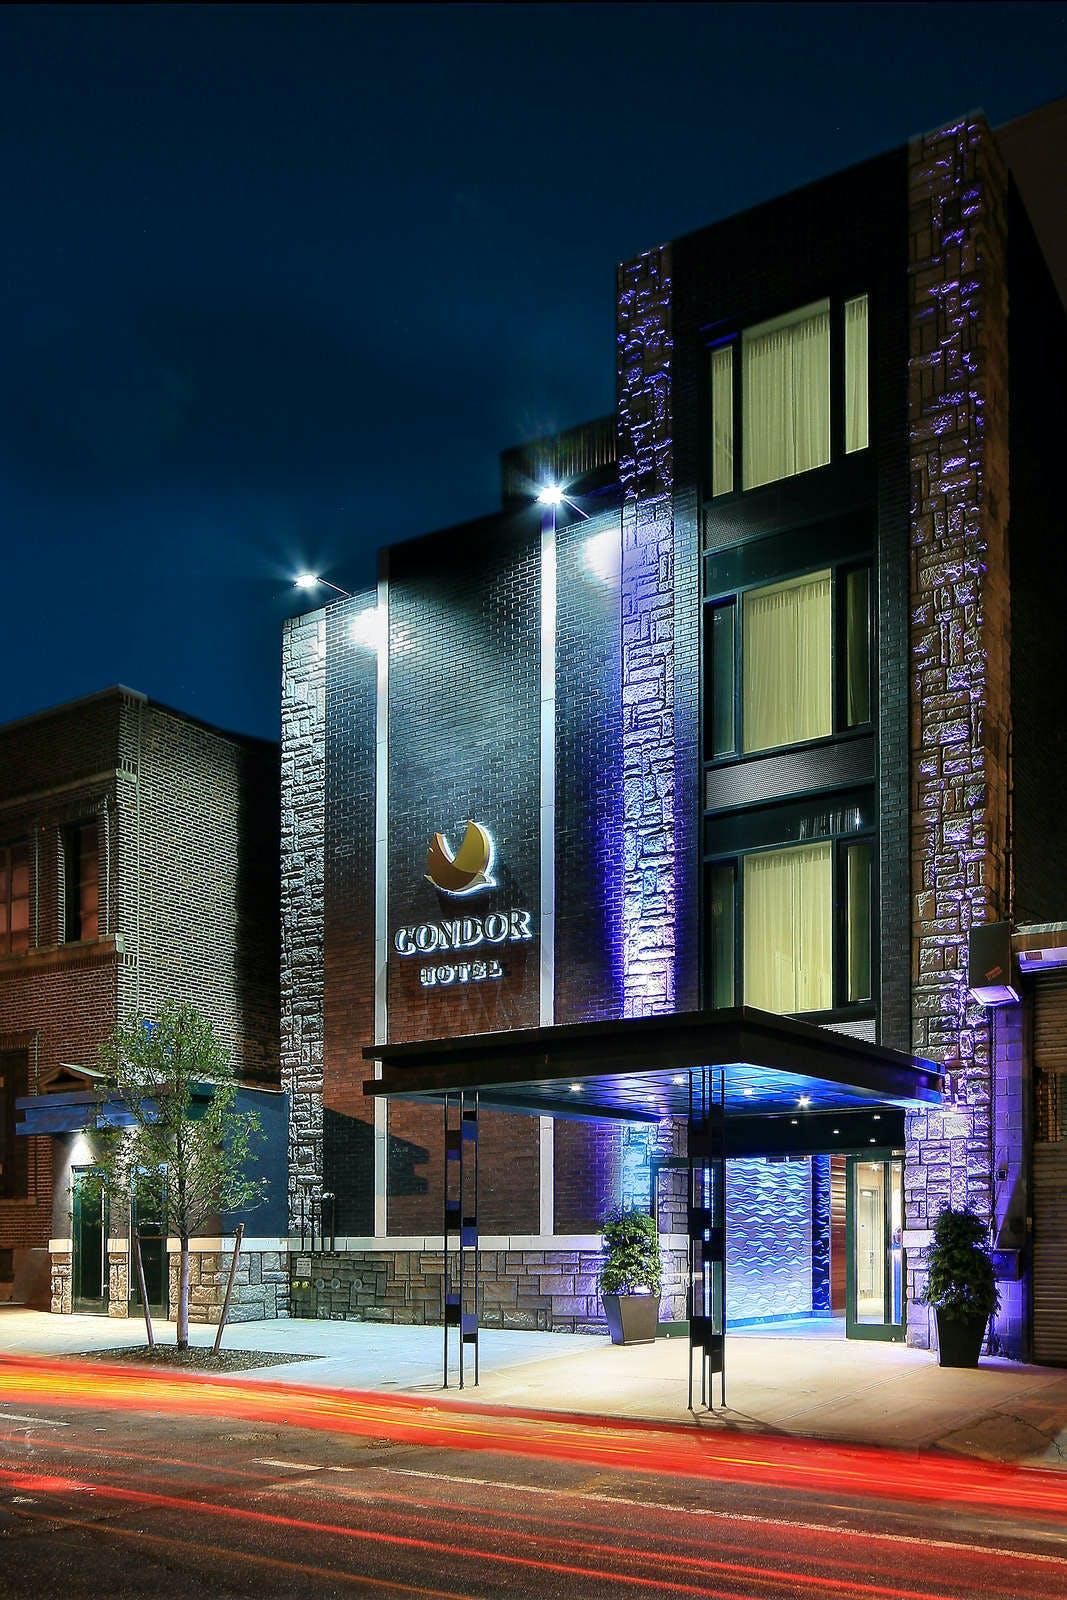 The Condor Hotel